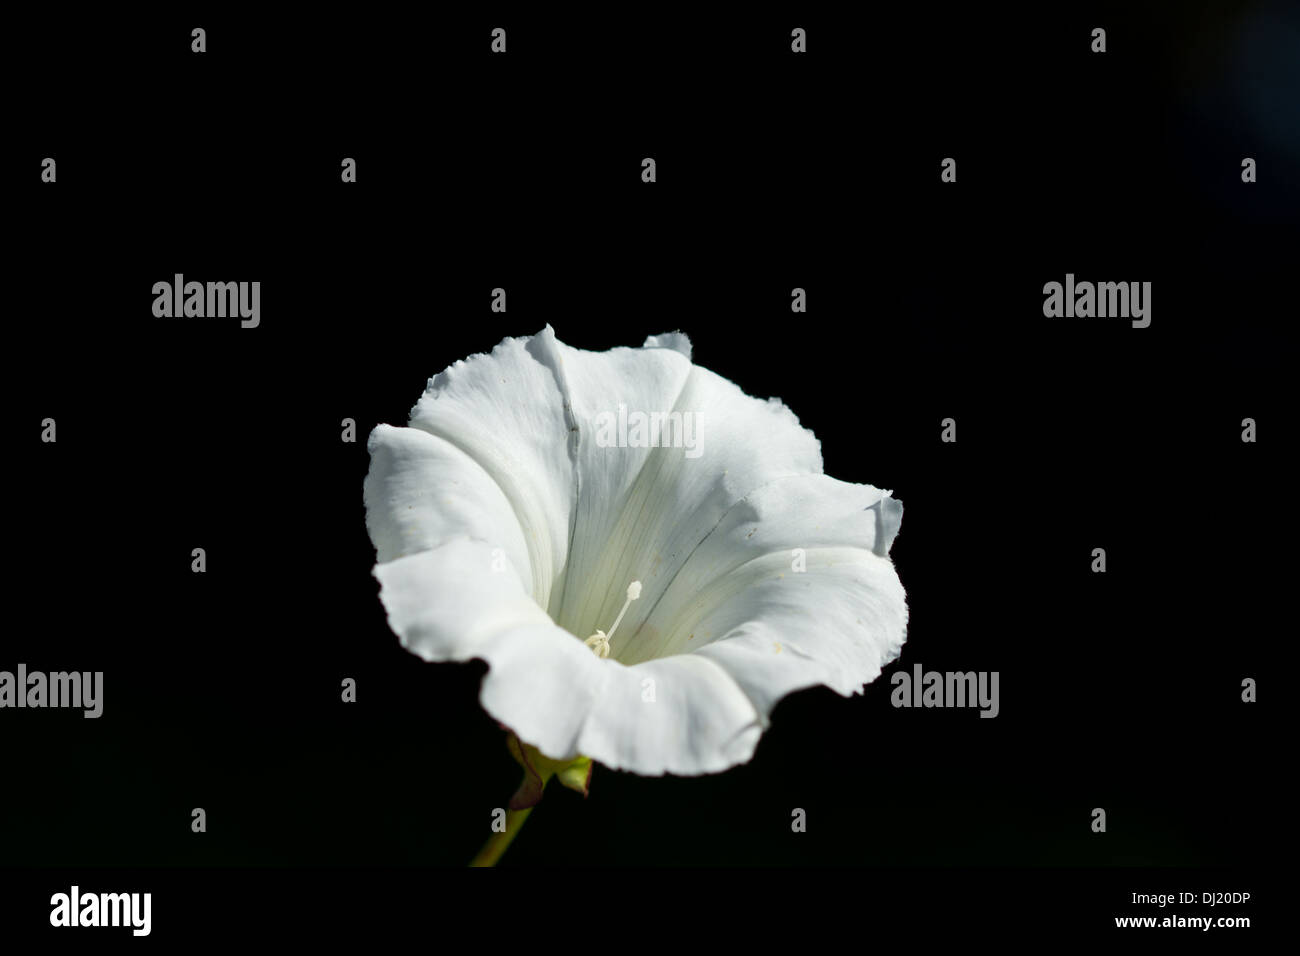 Convolvulus bindweed white flower stock photos convolvulus white flower of convolvulus arvensis commonly called bindweed stock image mightylinksfo